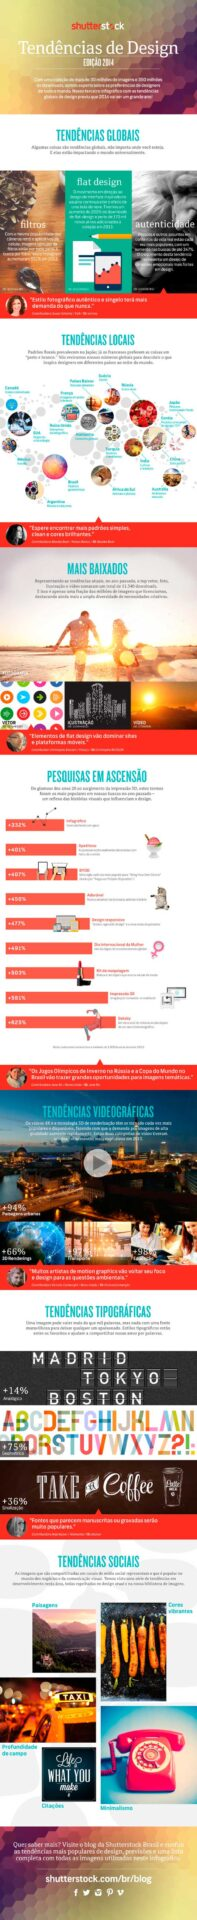 Infográfico Shutterstock: Tendências de design 2014.